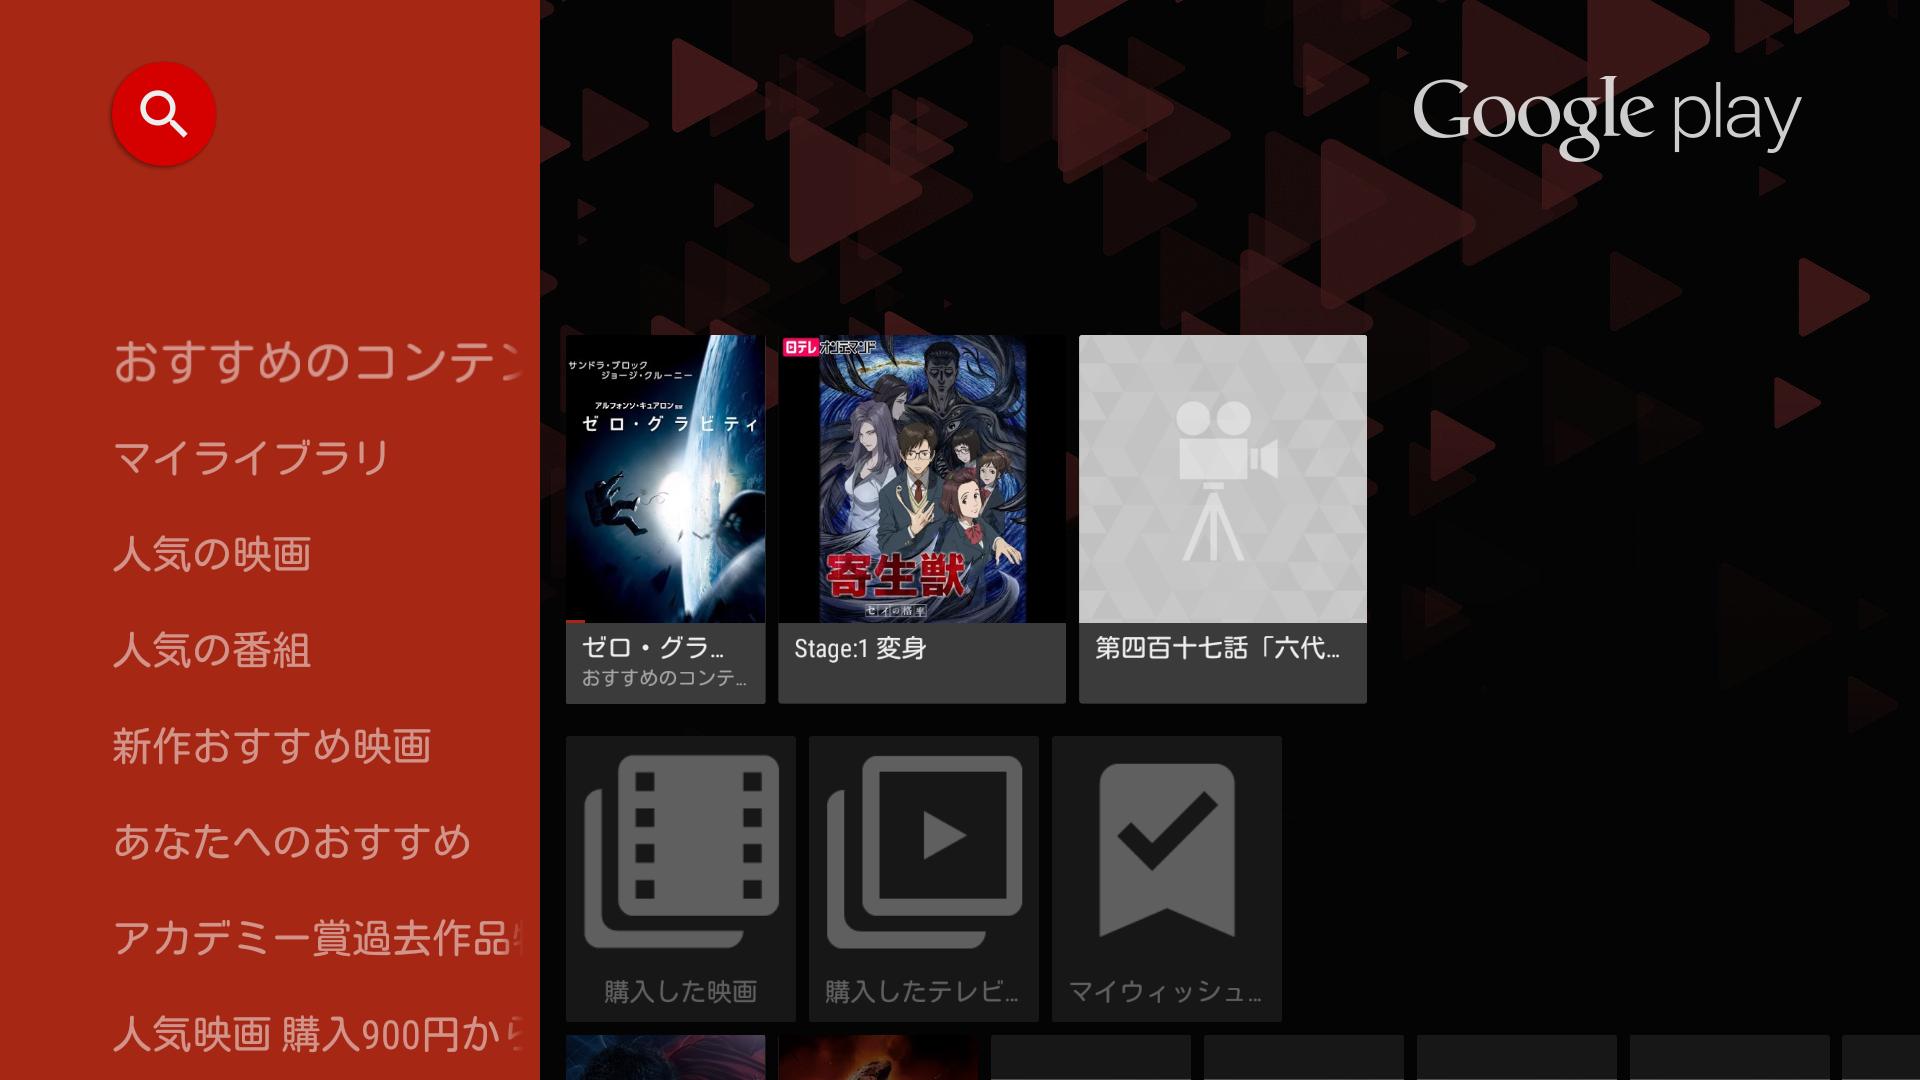 GooglePlayVideo